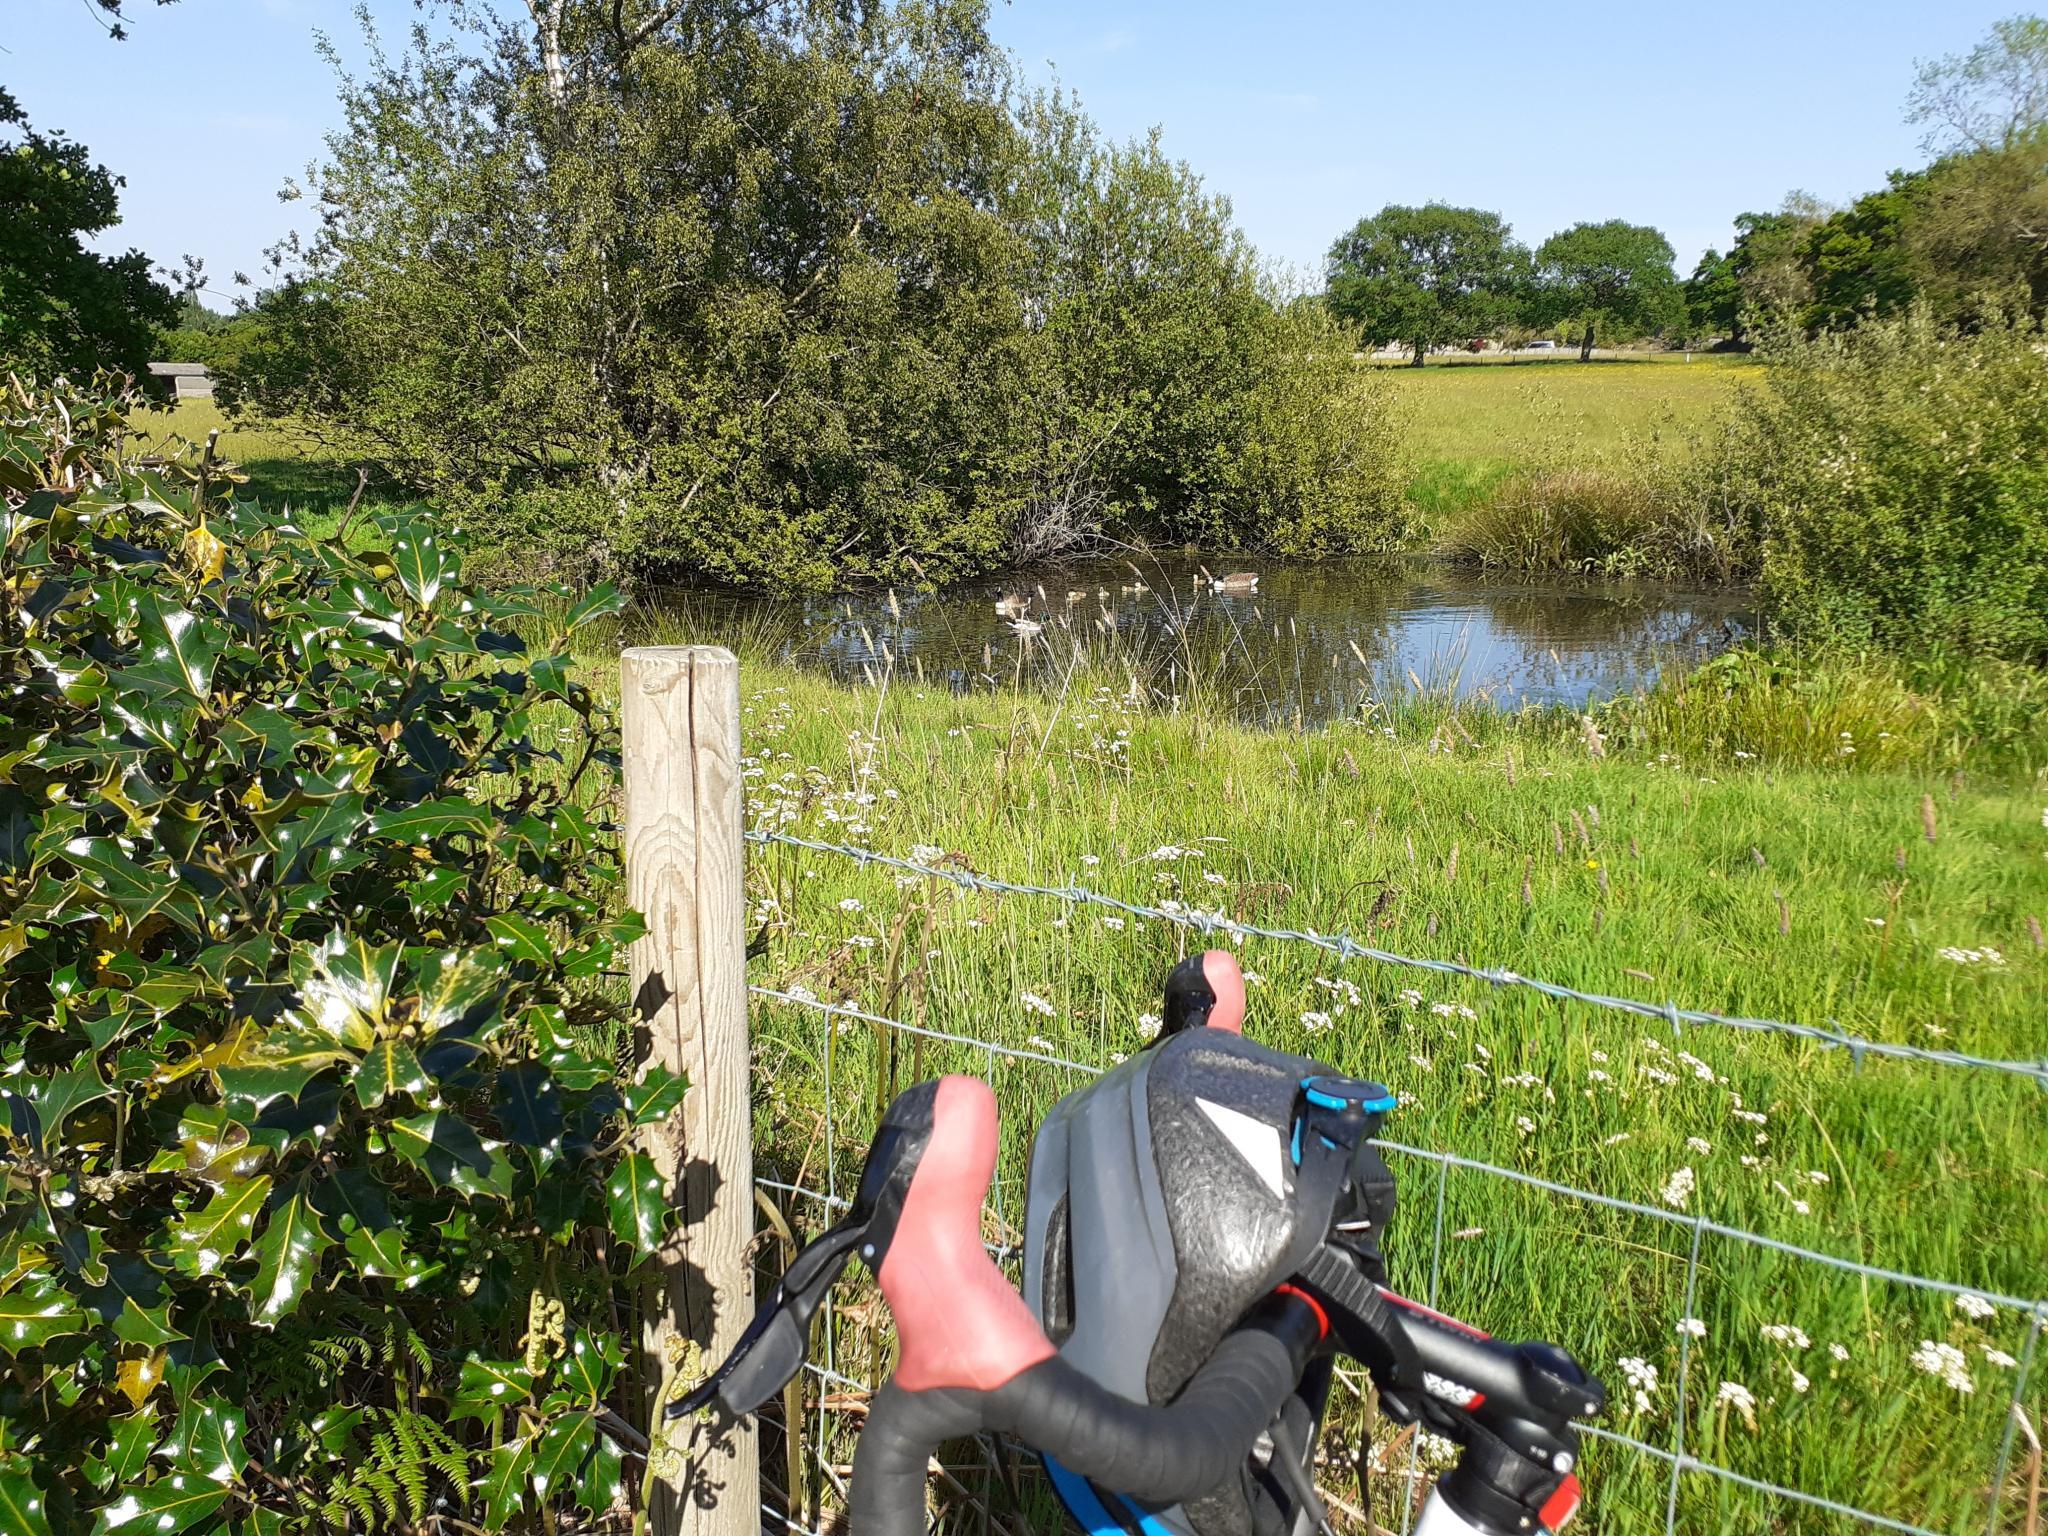 On my bike-20200520_162021-jpg